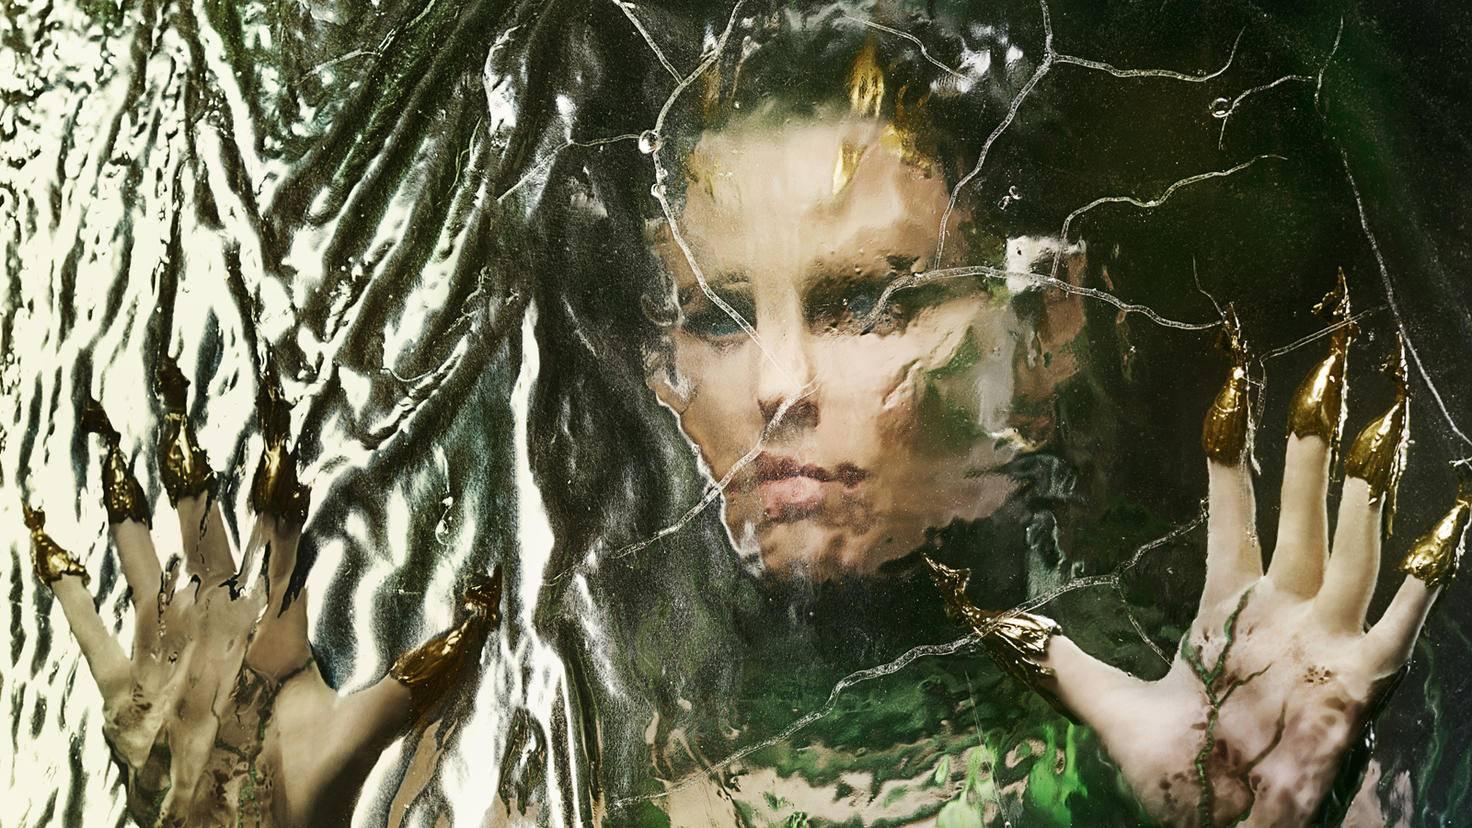 Goldig und biestig zugleich: Rita Repulsa (Elizabeth Banks).